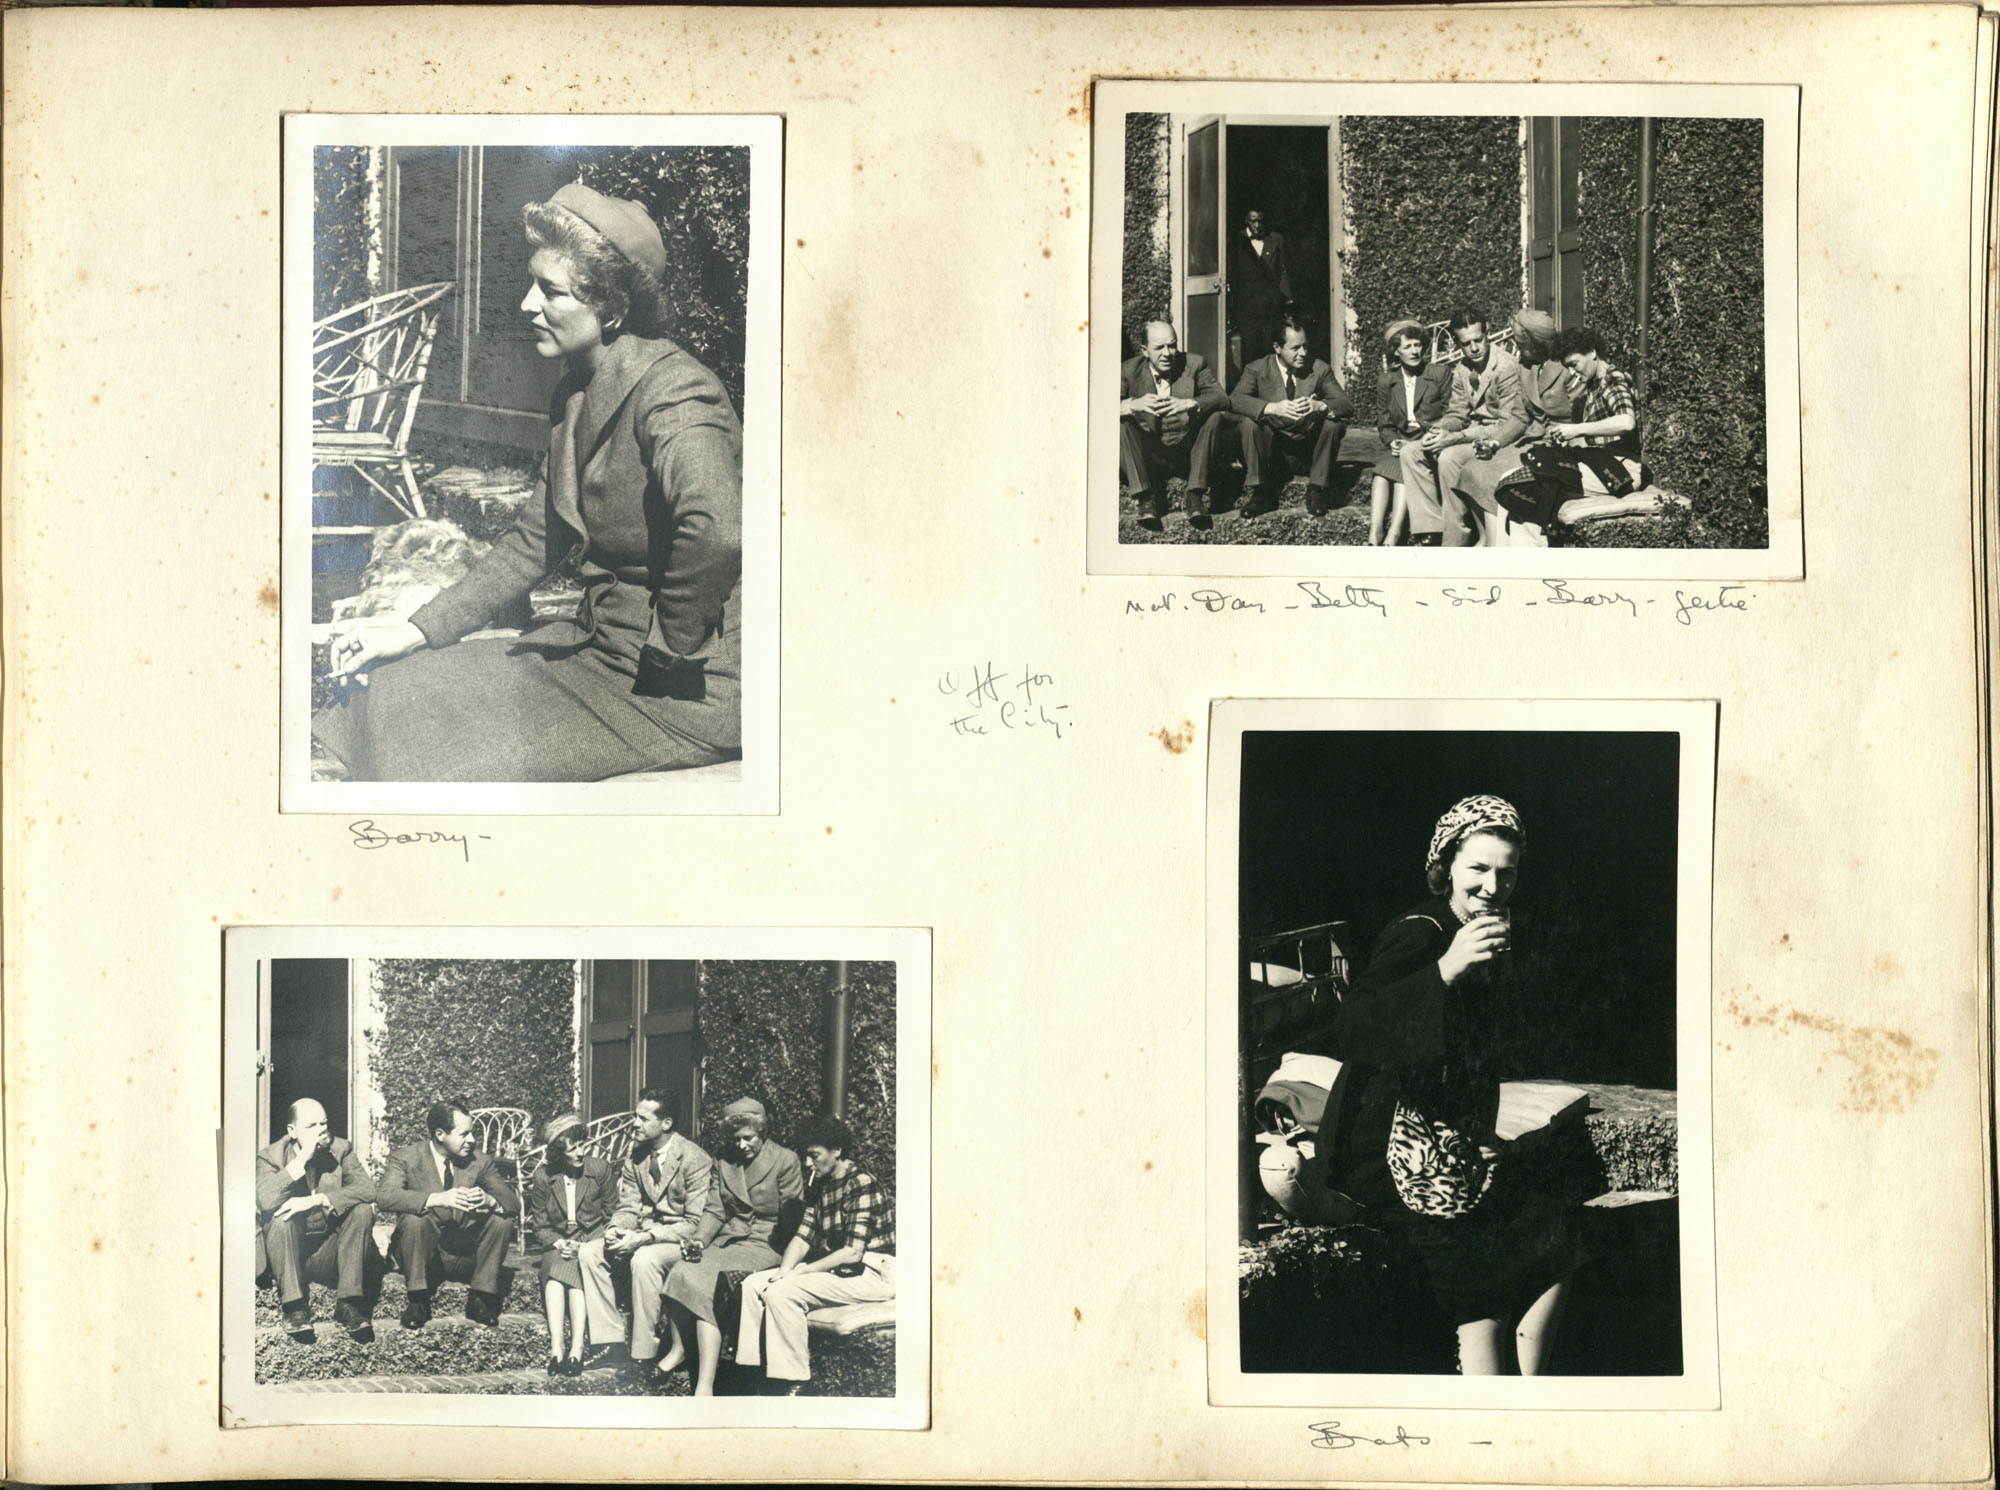 Medway Plantation Photograph Album, 1949, page 113